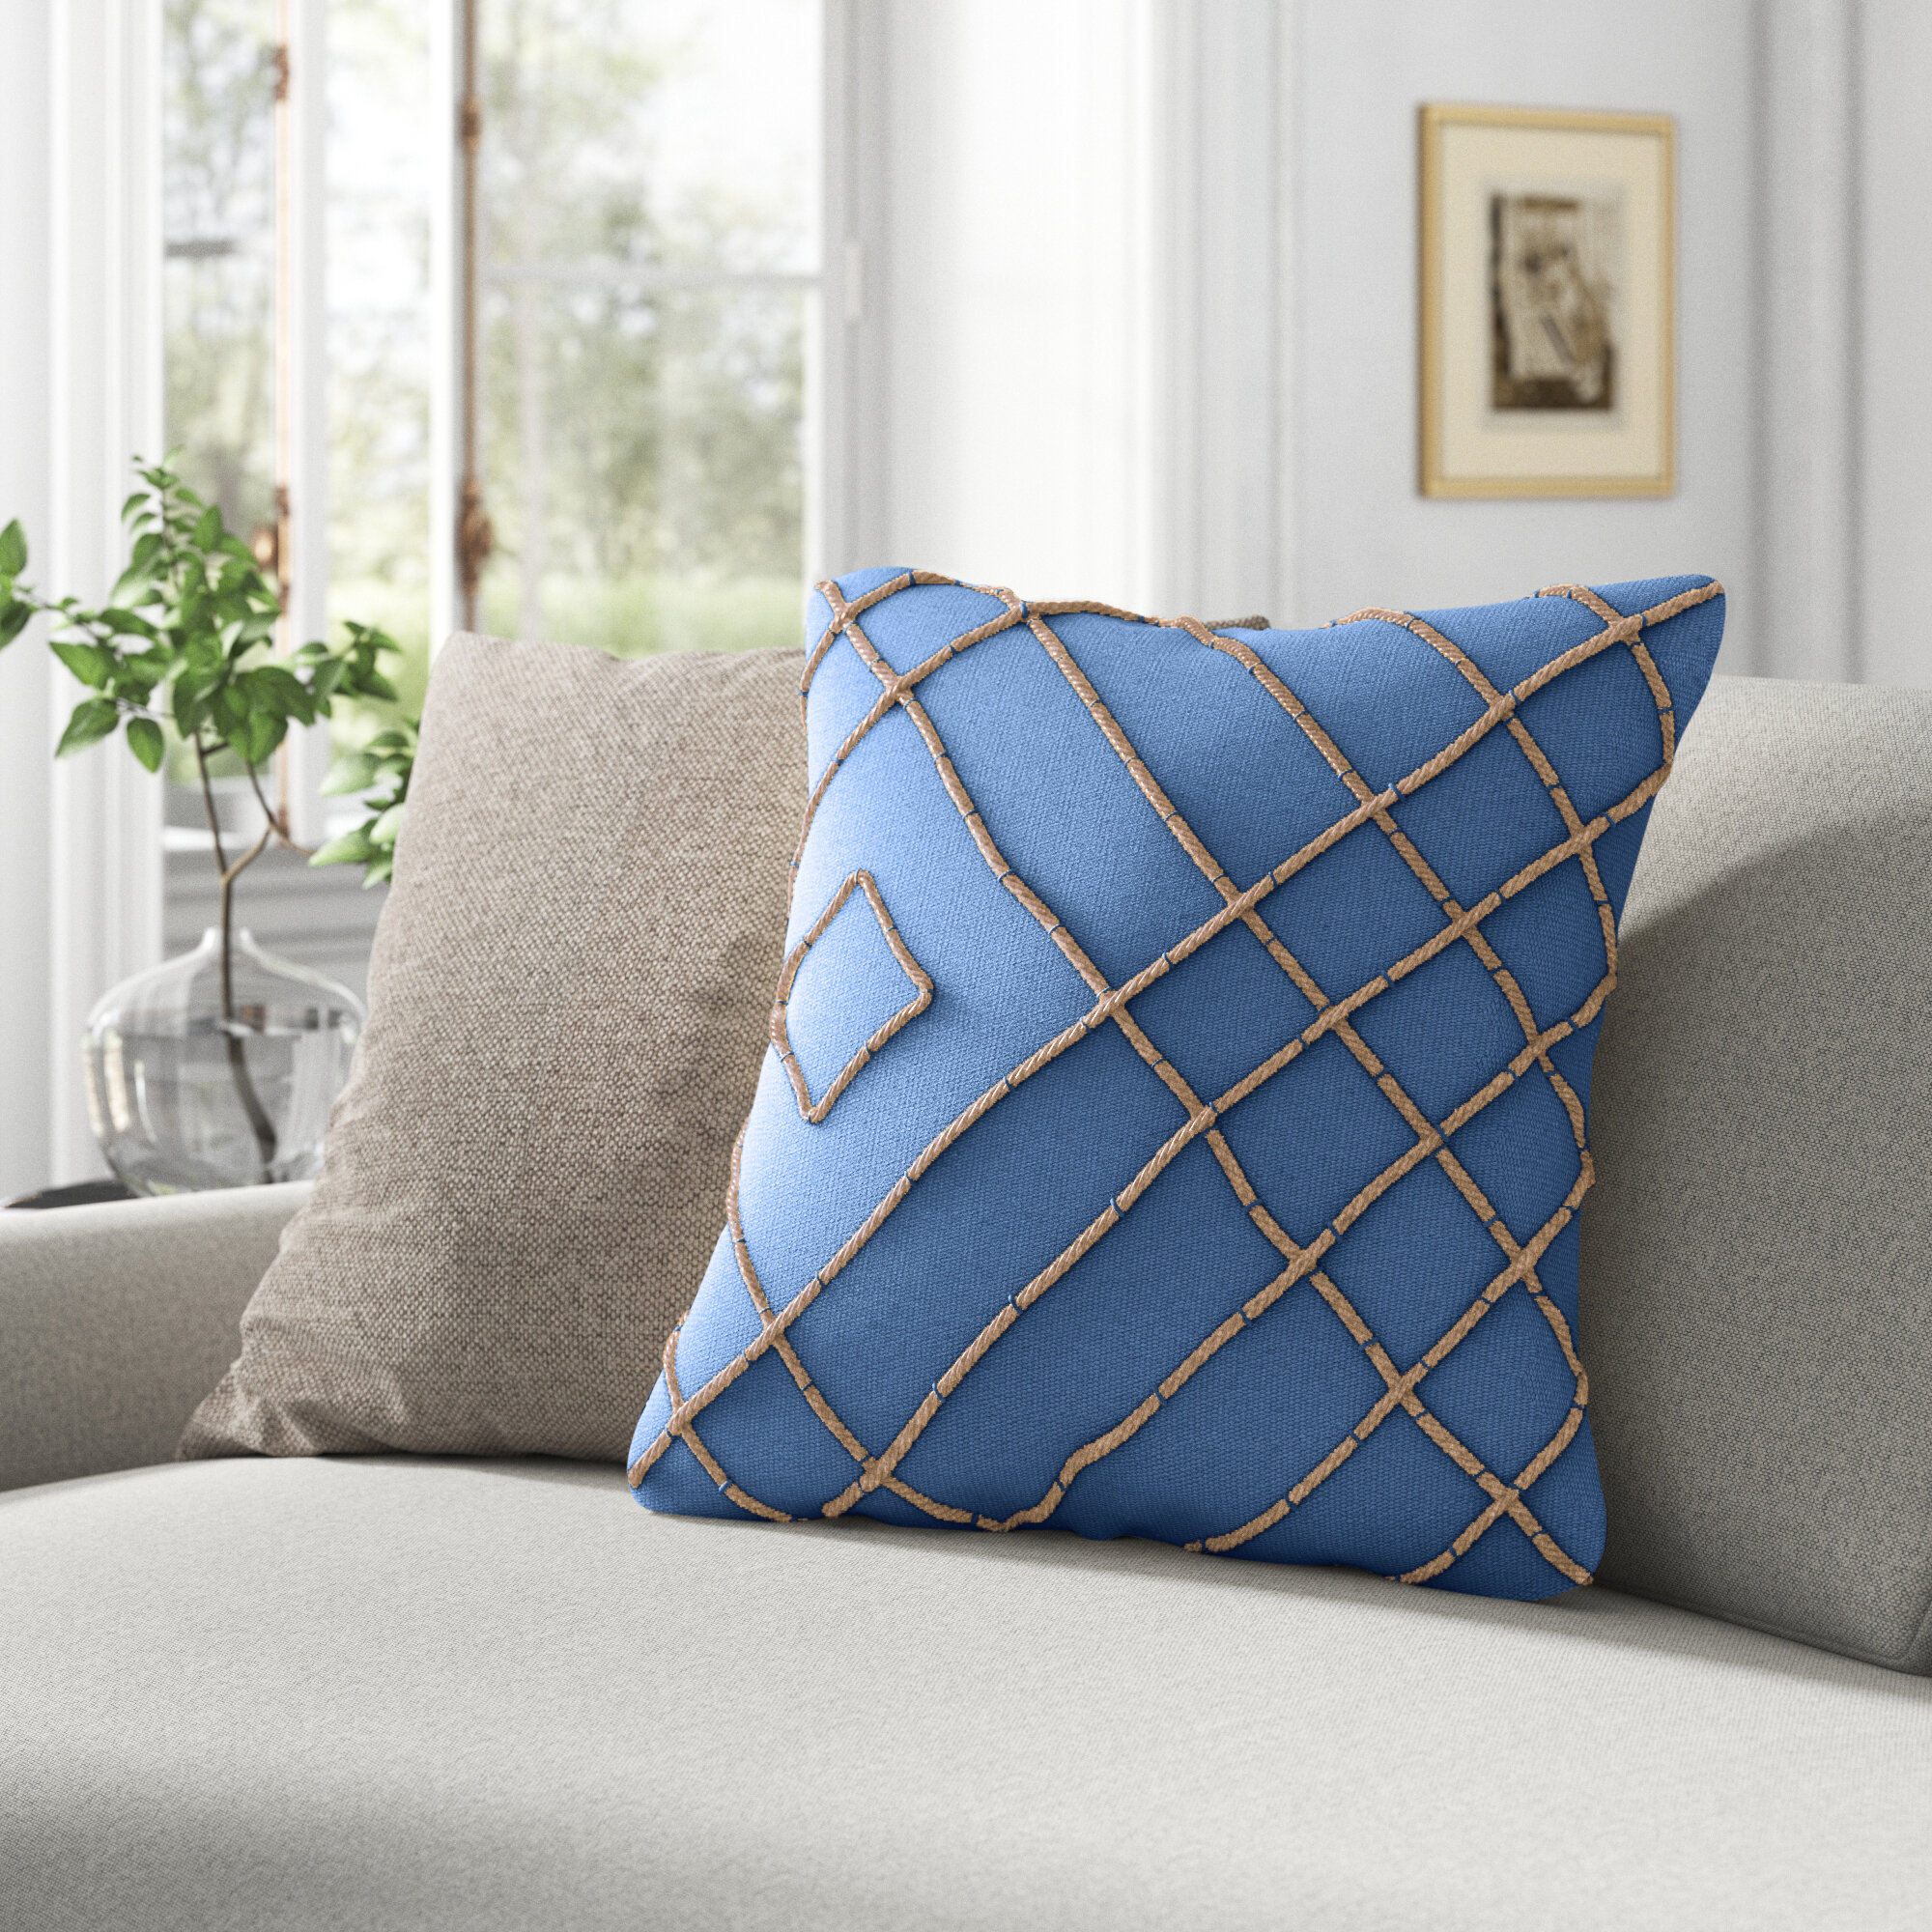 Geometric Kelly Clarkson Home Throw Pillows You Ll Love In 2021 Wayfair